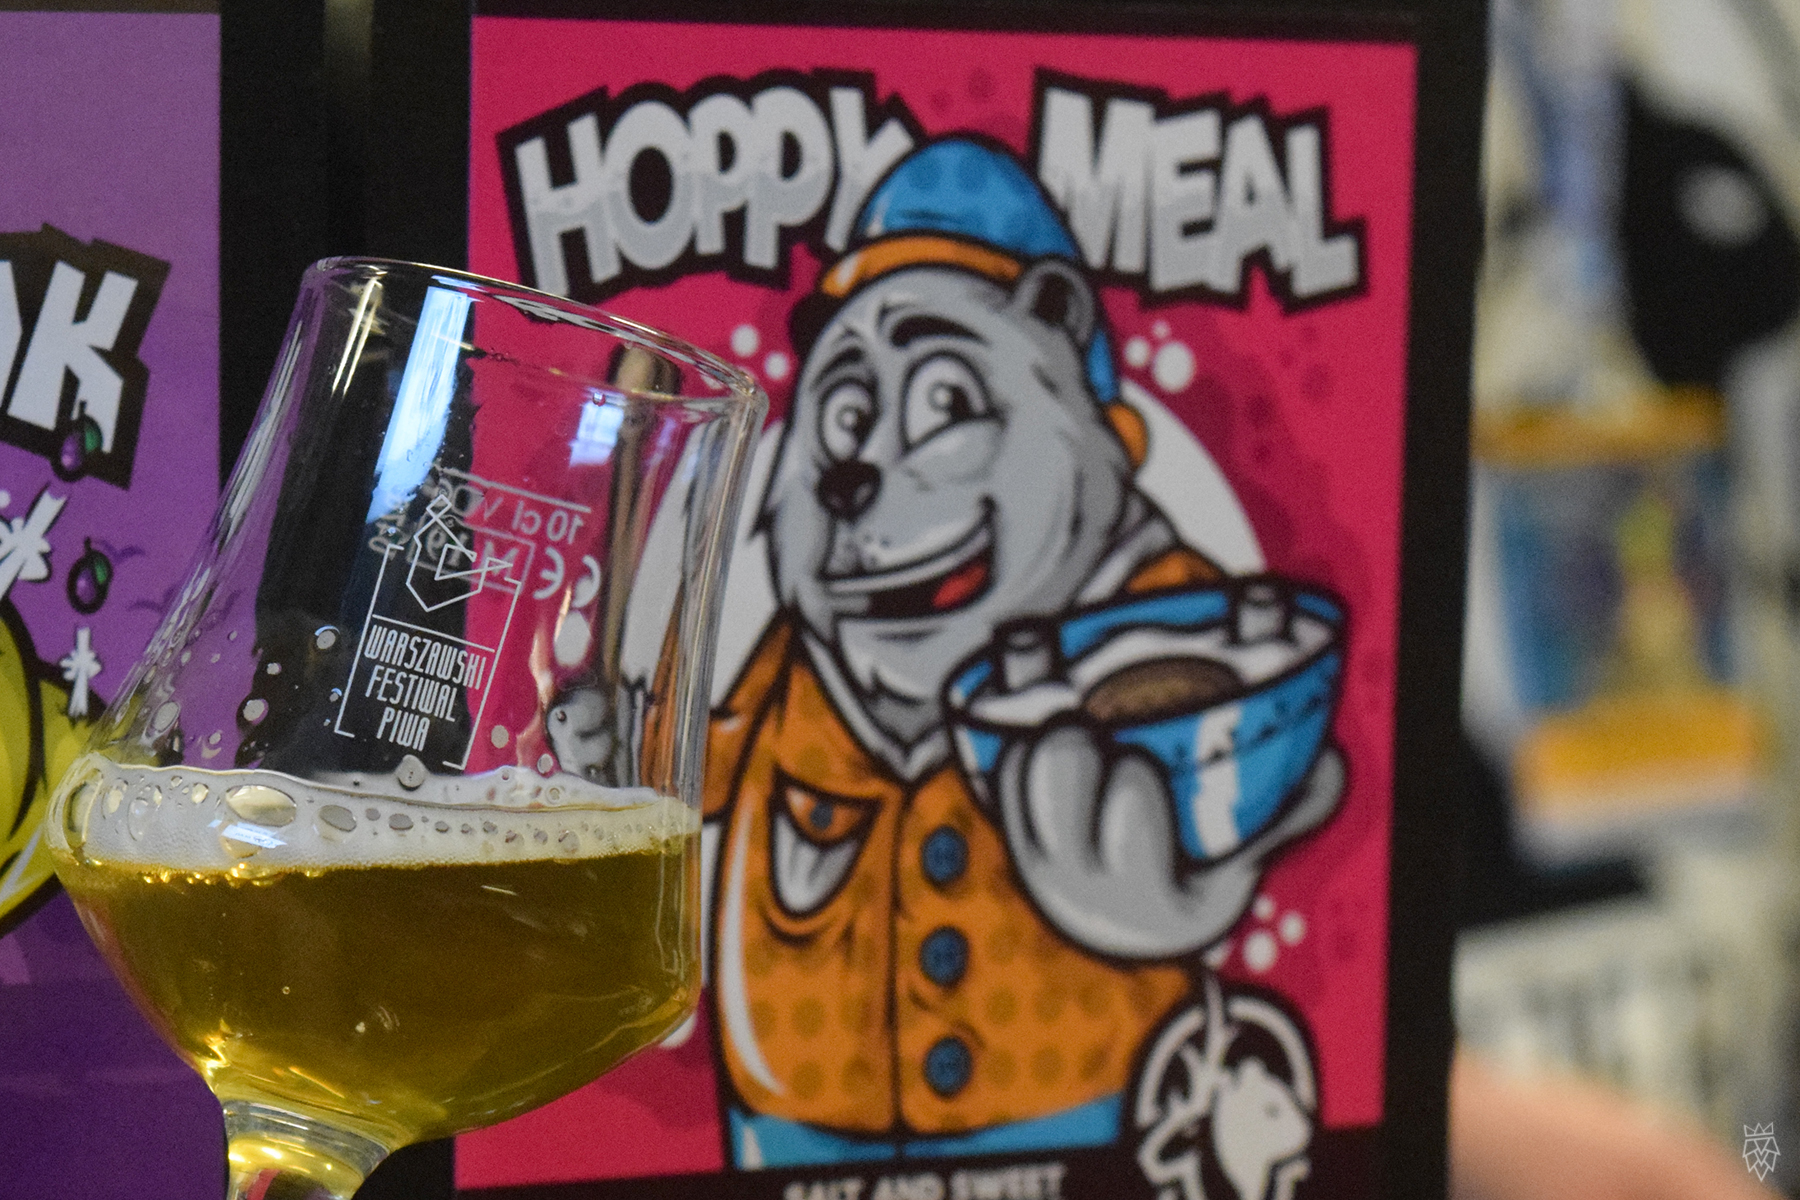 Hoppy Meal WFP